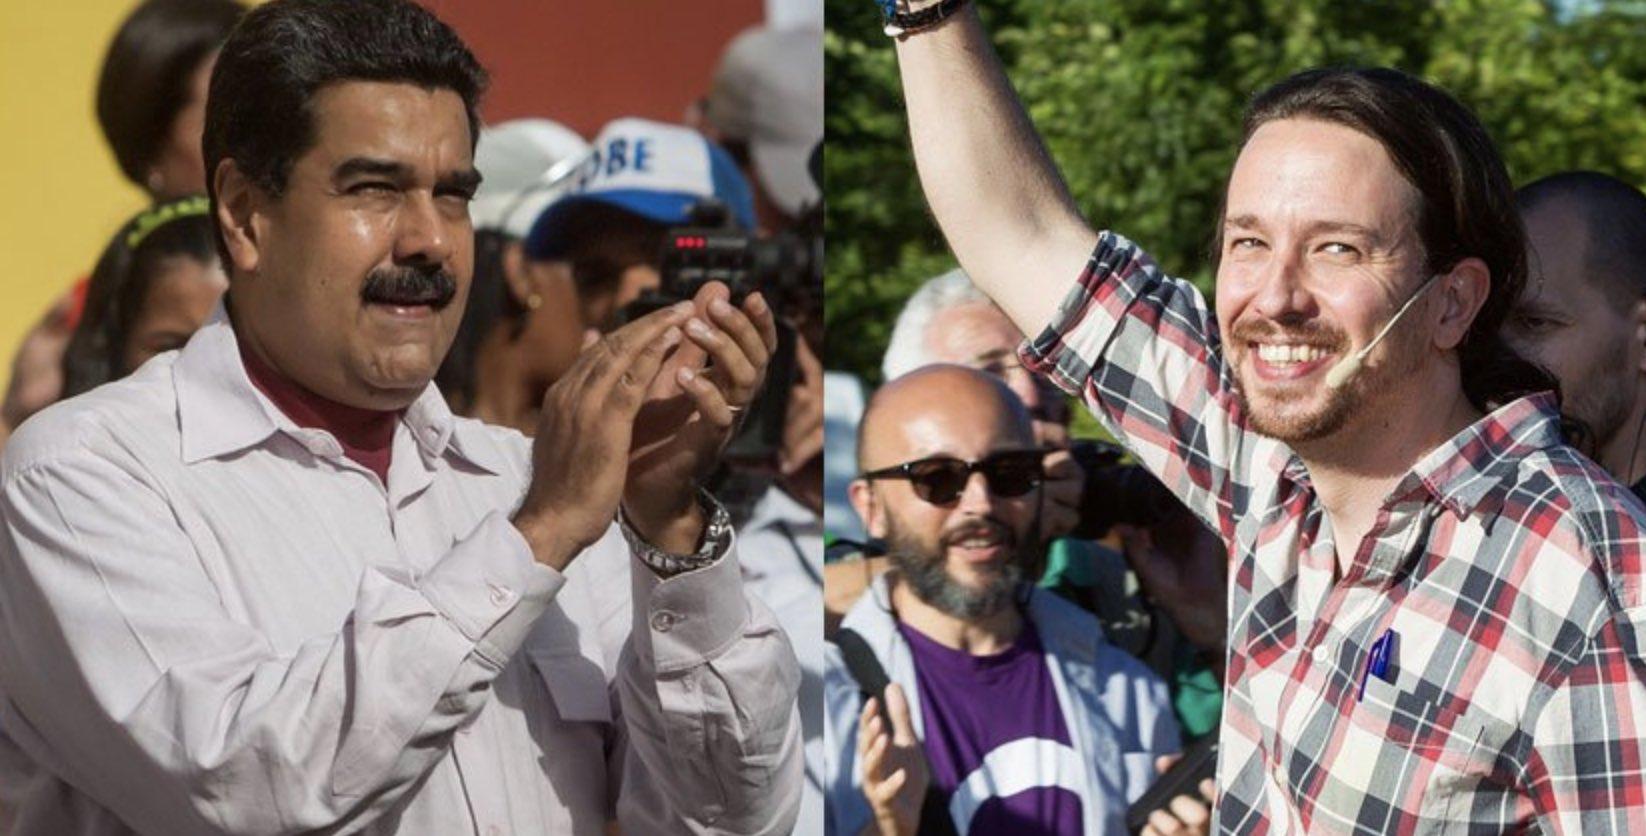 Pablo Iglesias, Nicolás Maduro, Gobierno español, Unidas Podemos